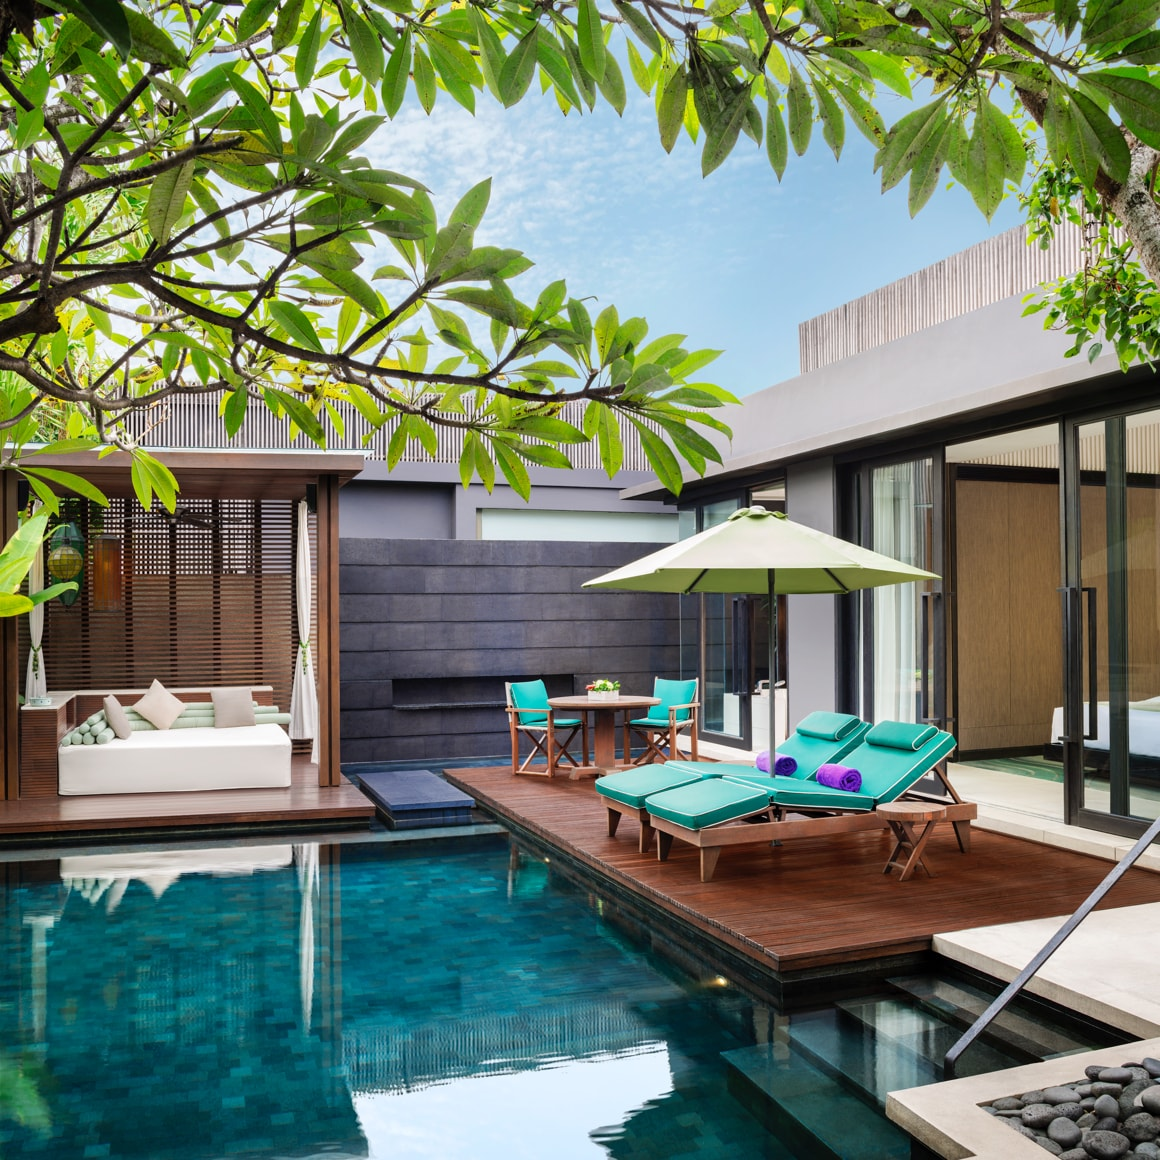 Terraza con lounges sobre la piscina al aire libre